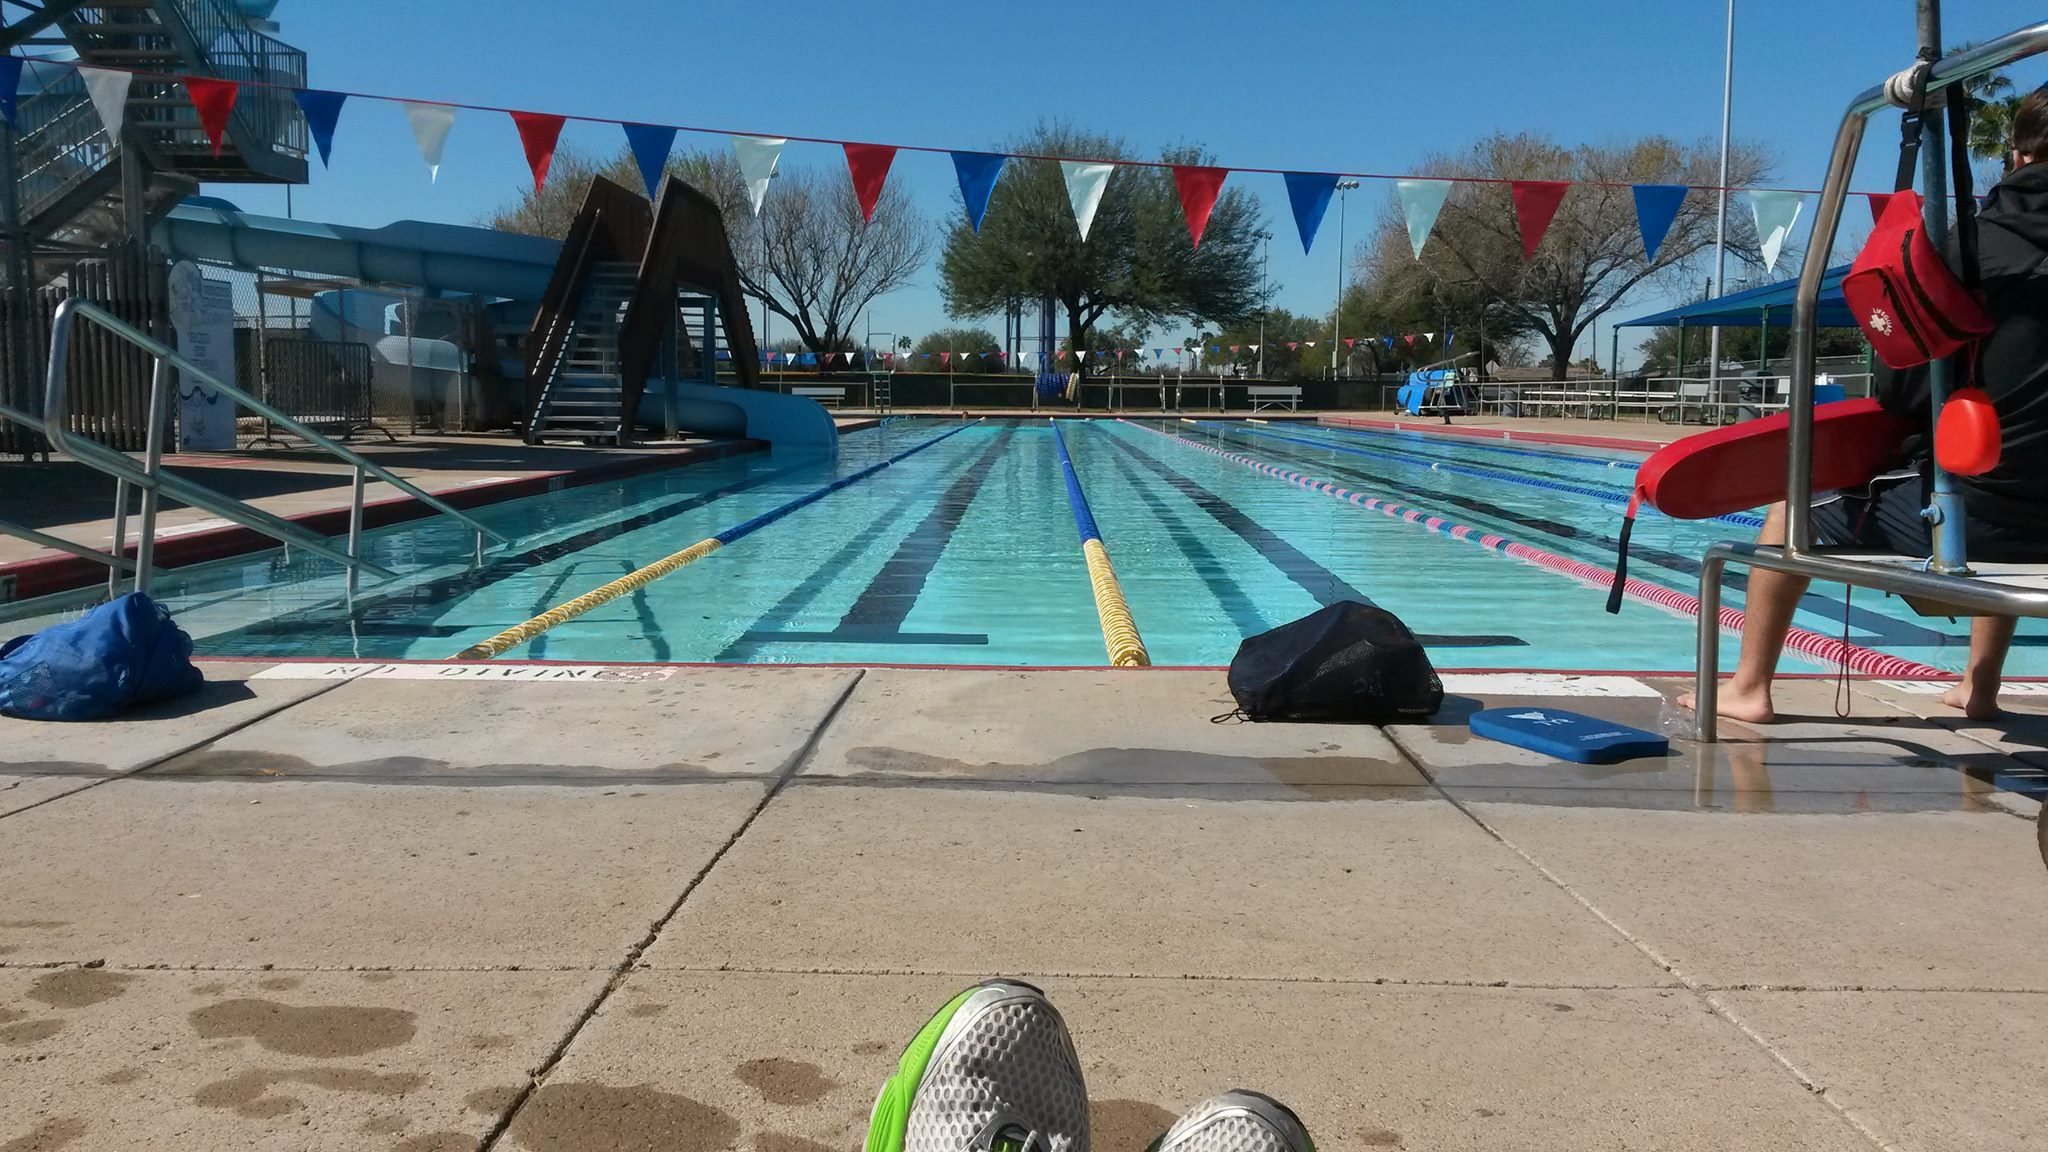 Mcallen Munil Park And Pool